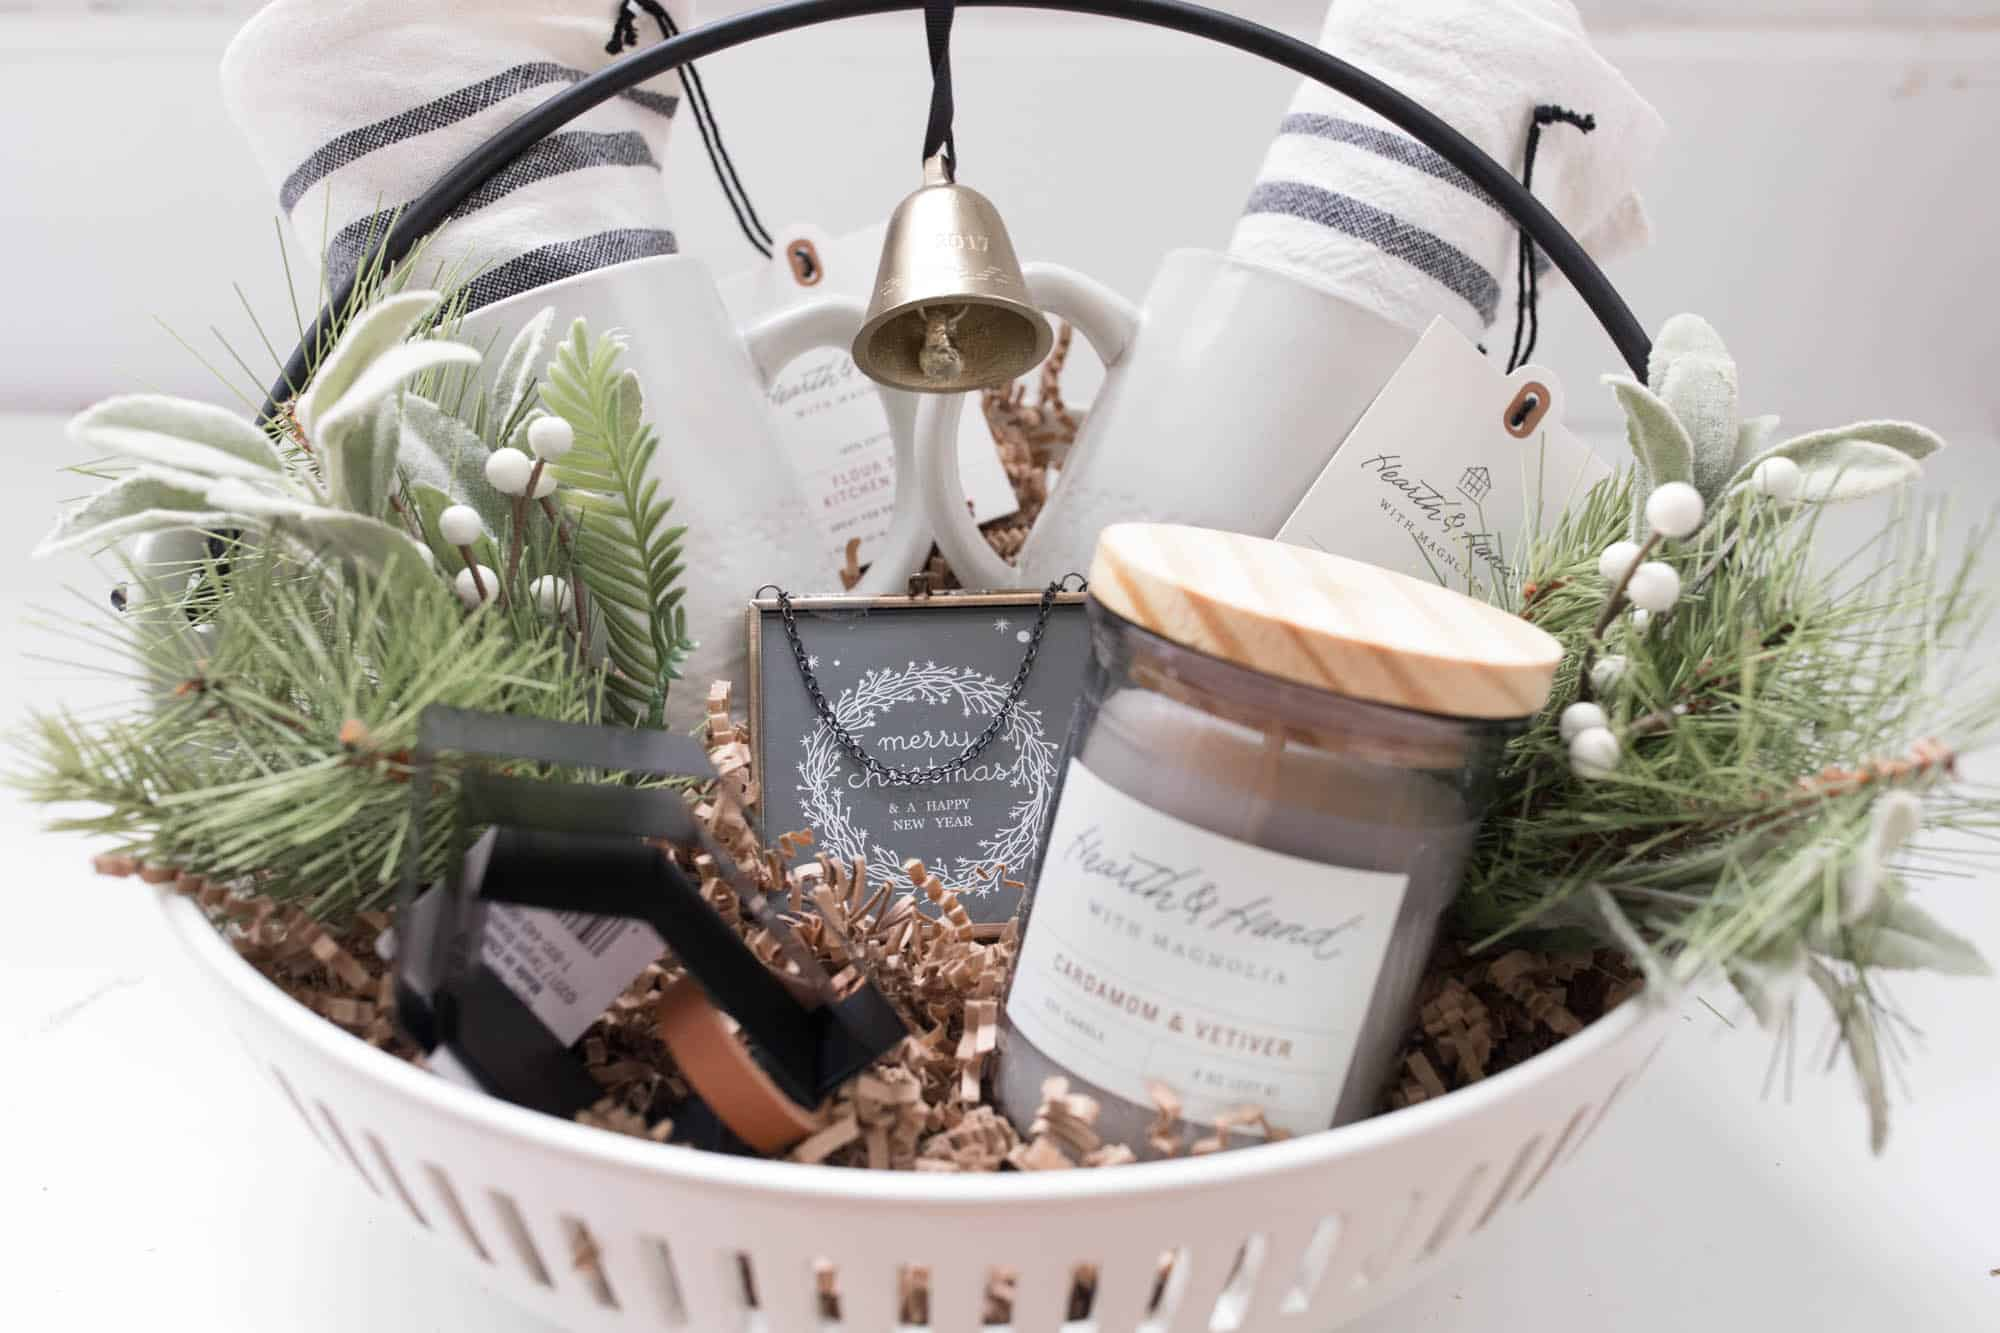 Hearth and Hand Gift Basket Idea for the Farmhouse Decor Lover on Your List